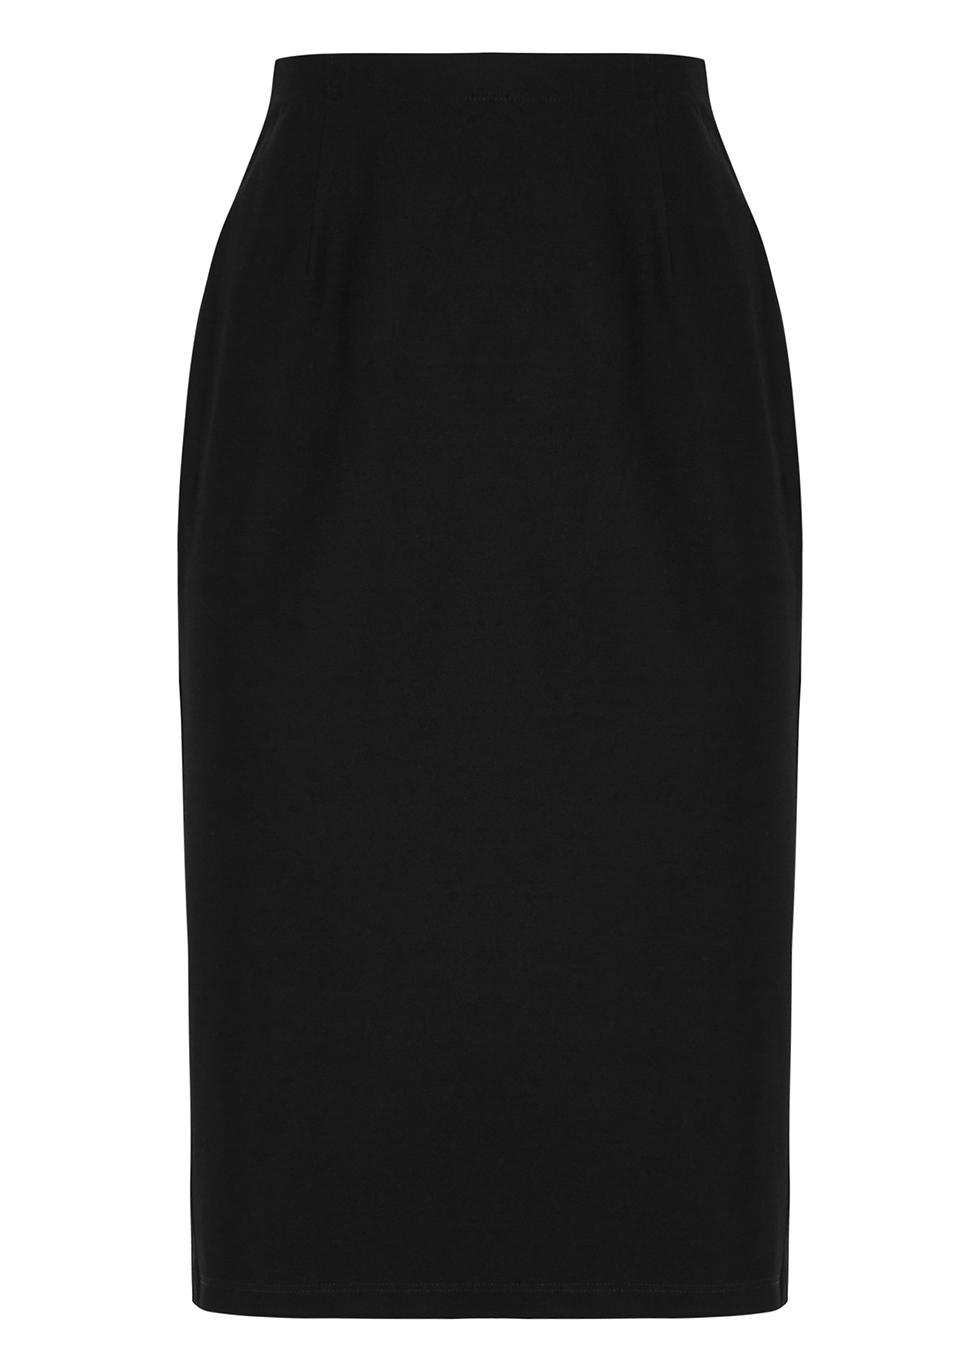 Black high-waisted pencil skirt